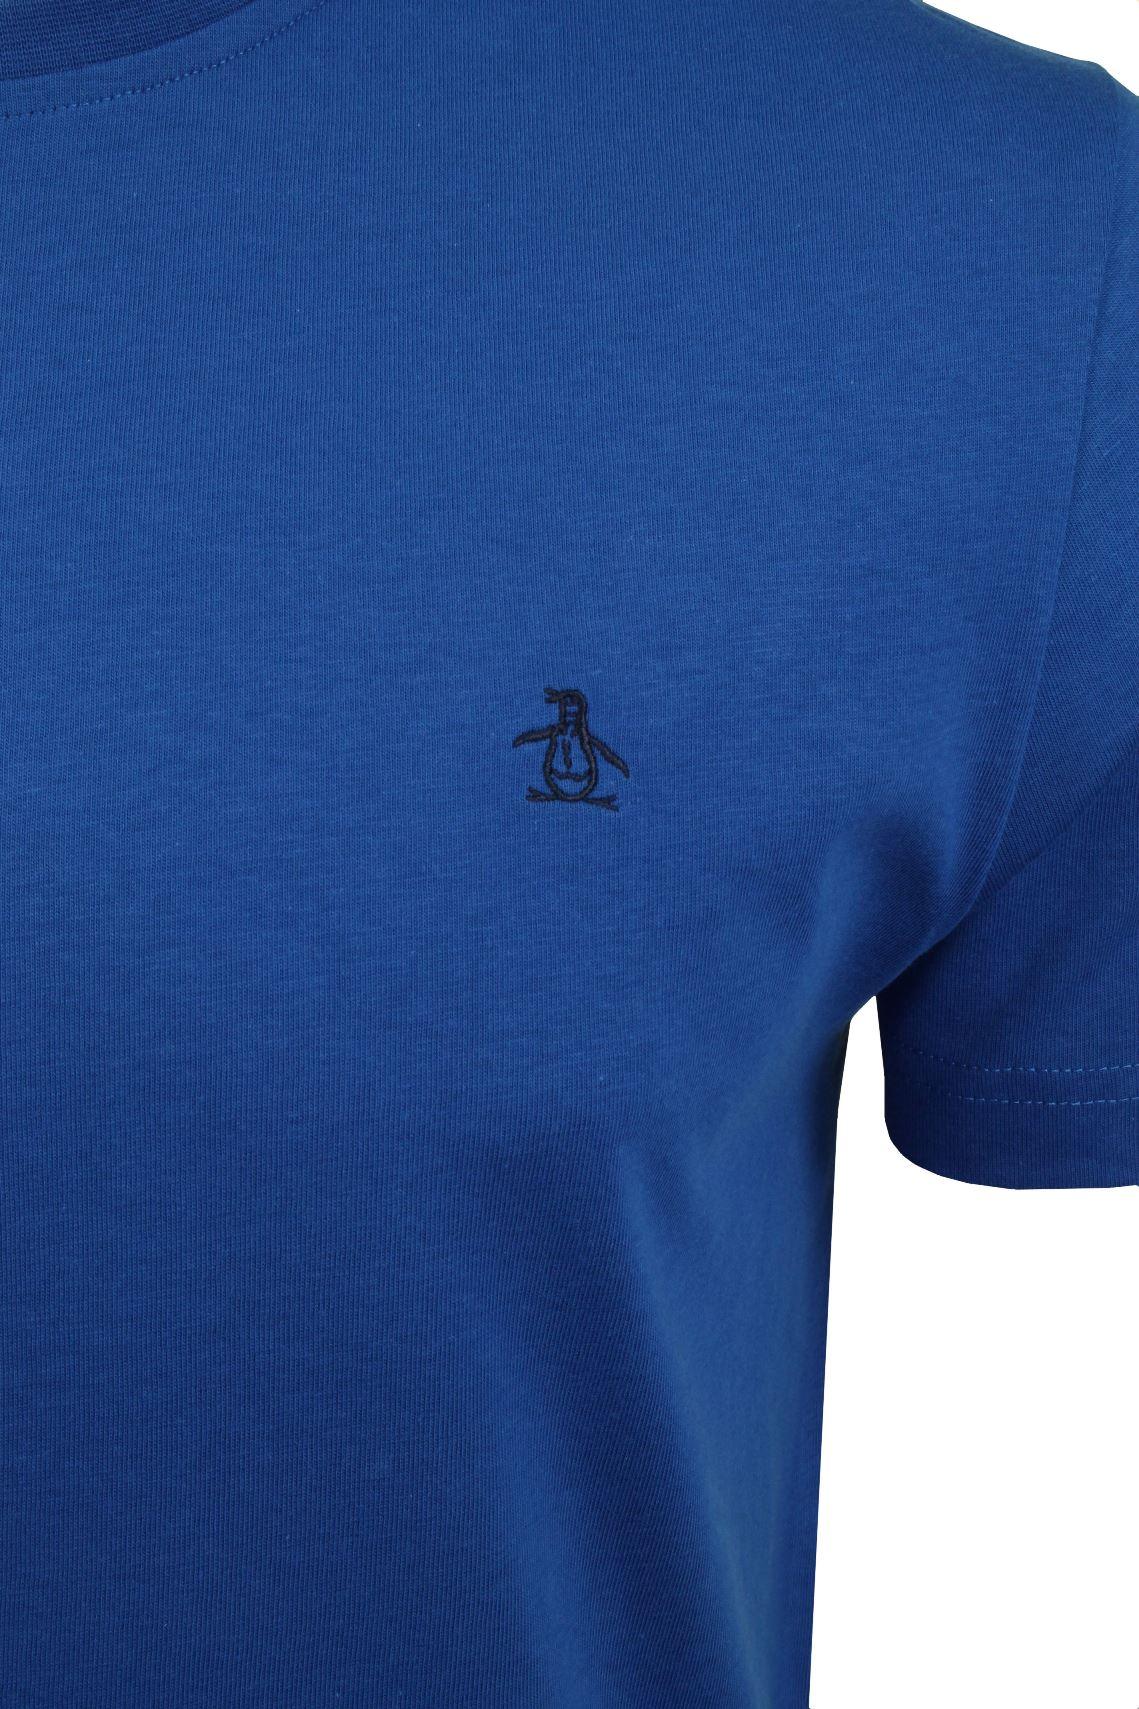 Mens-T-Shirt-by-Original-Penguin-Crew-Neck-Short-Sleeved thumbnail 46